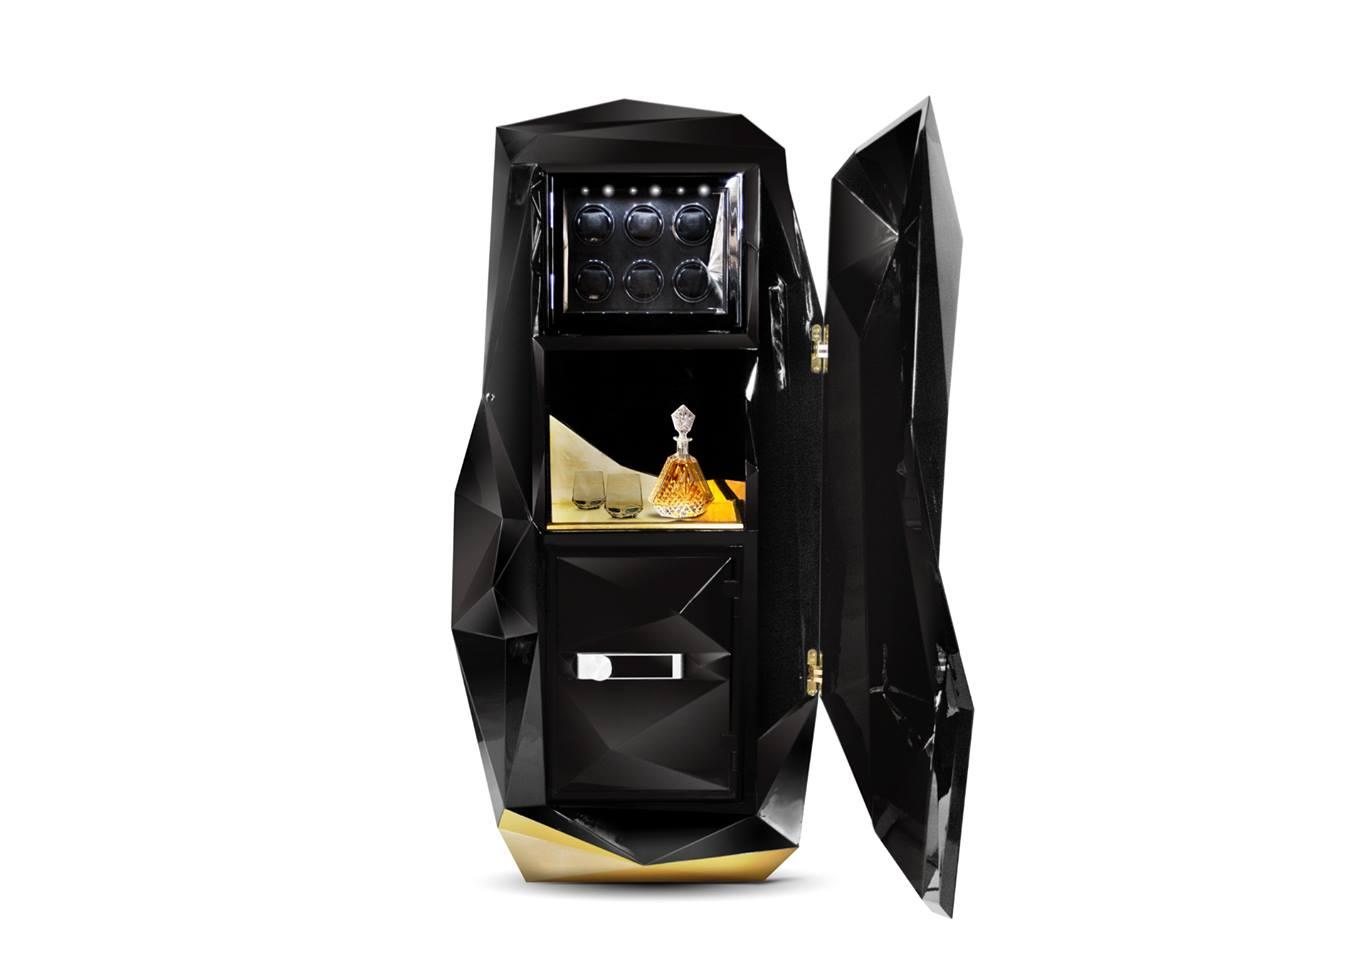 "design ""Diamonds Are Forever"": Diamond Family The Classic Design for Your Home 10699721 751150331609261 4031443081958156587 o"